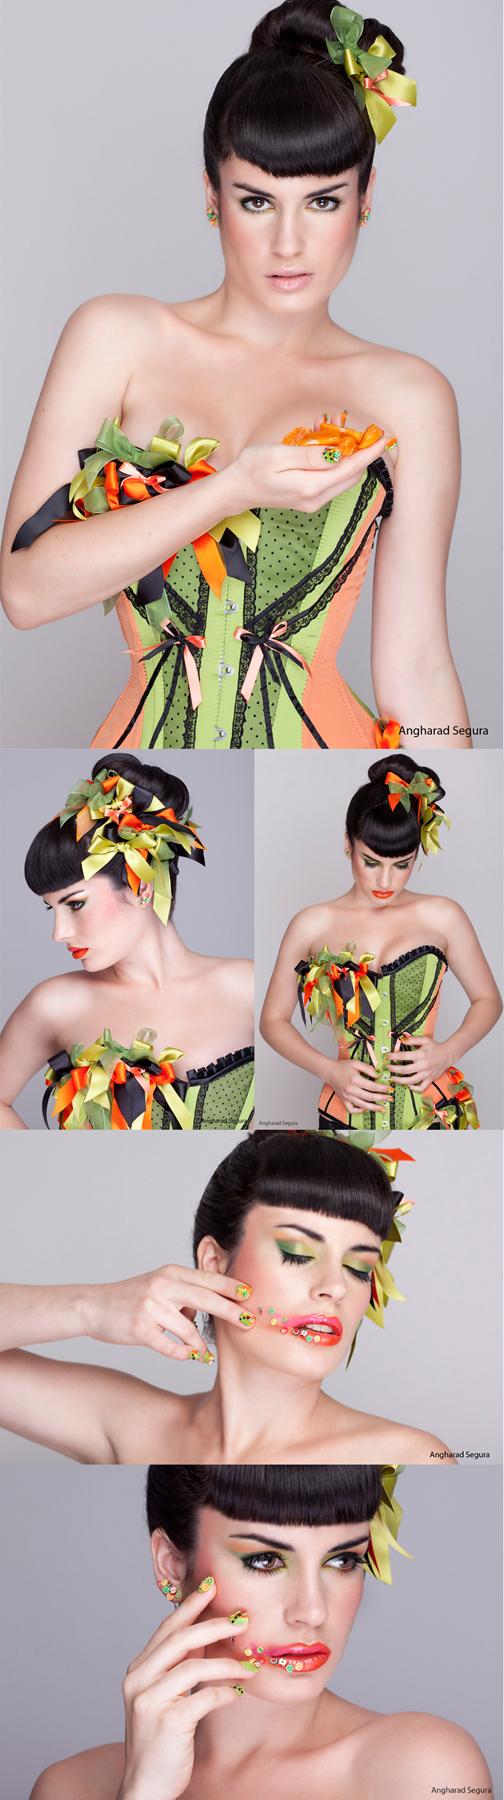 Oct 30, 2011 angharad segura @ kiwi&mandarina - esther gomez & marta design